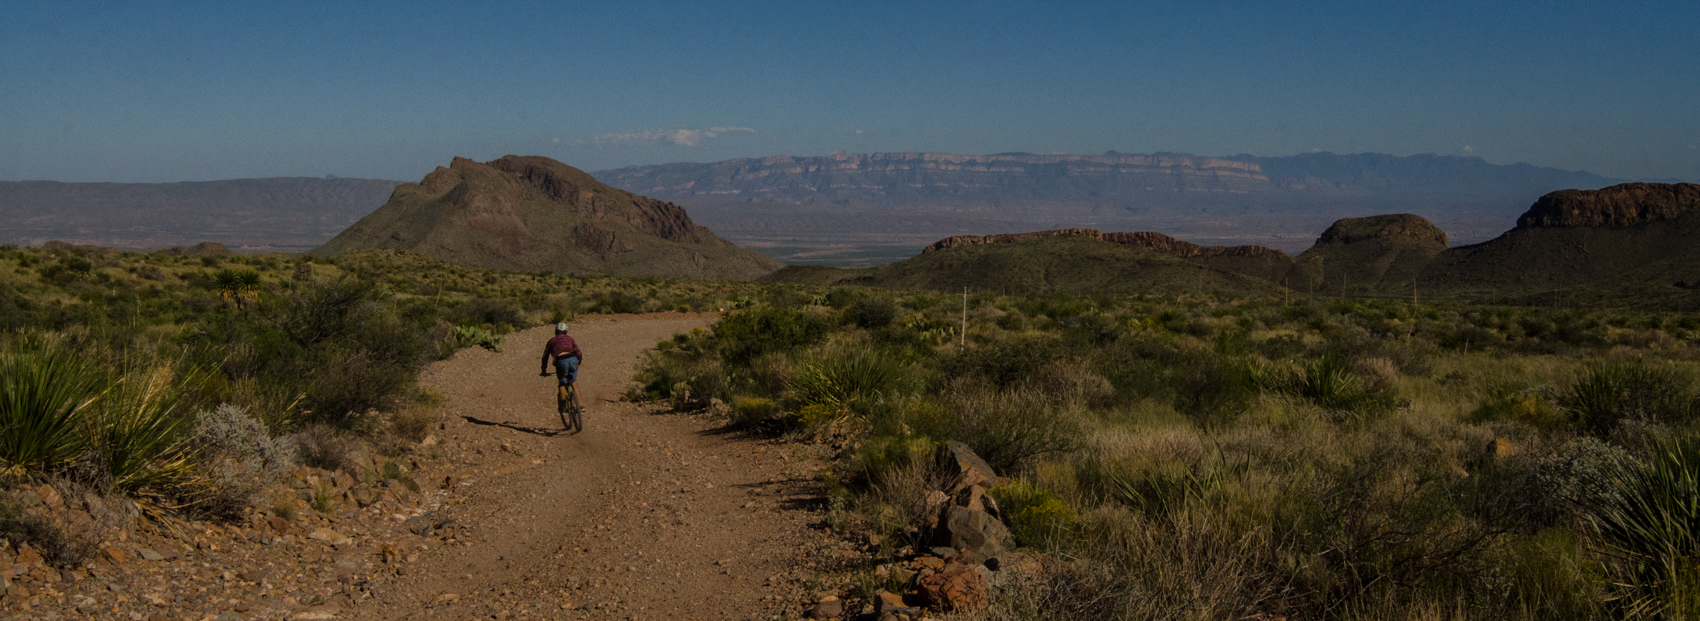 Mountain biking in big bend national park-leh cycling goods-3.jpg